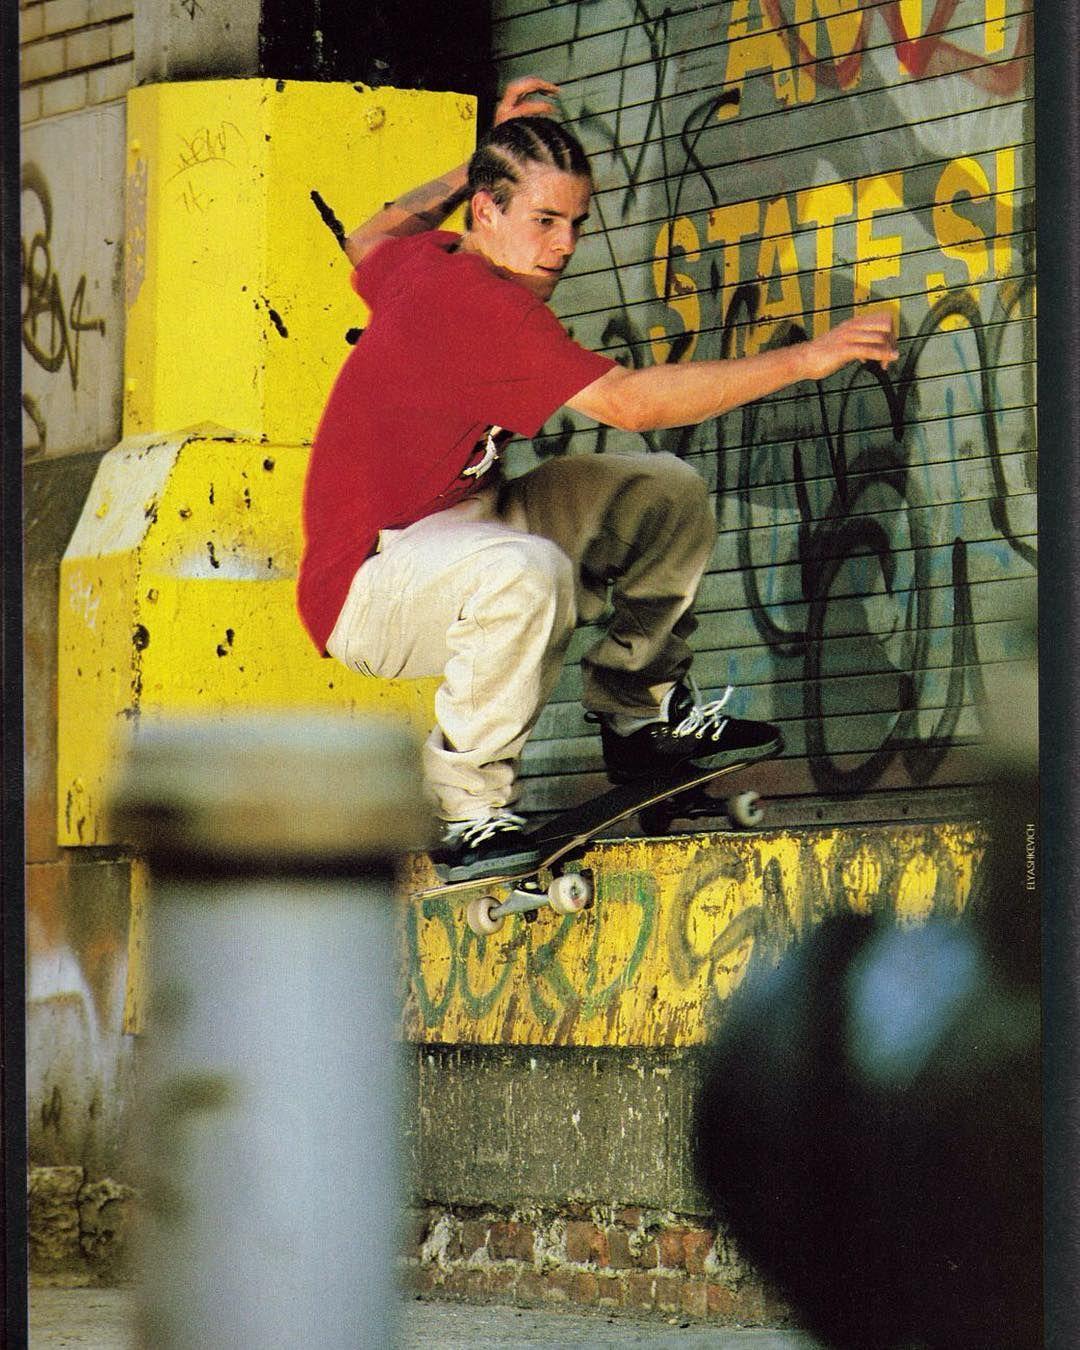 Ennie Kirk Frontside Lipslide Phot Skateboard Pictures Skateboard Photography Old School Skateboards